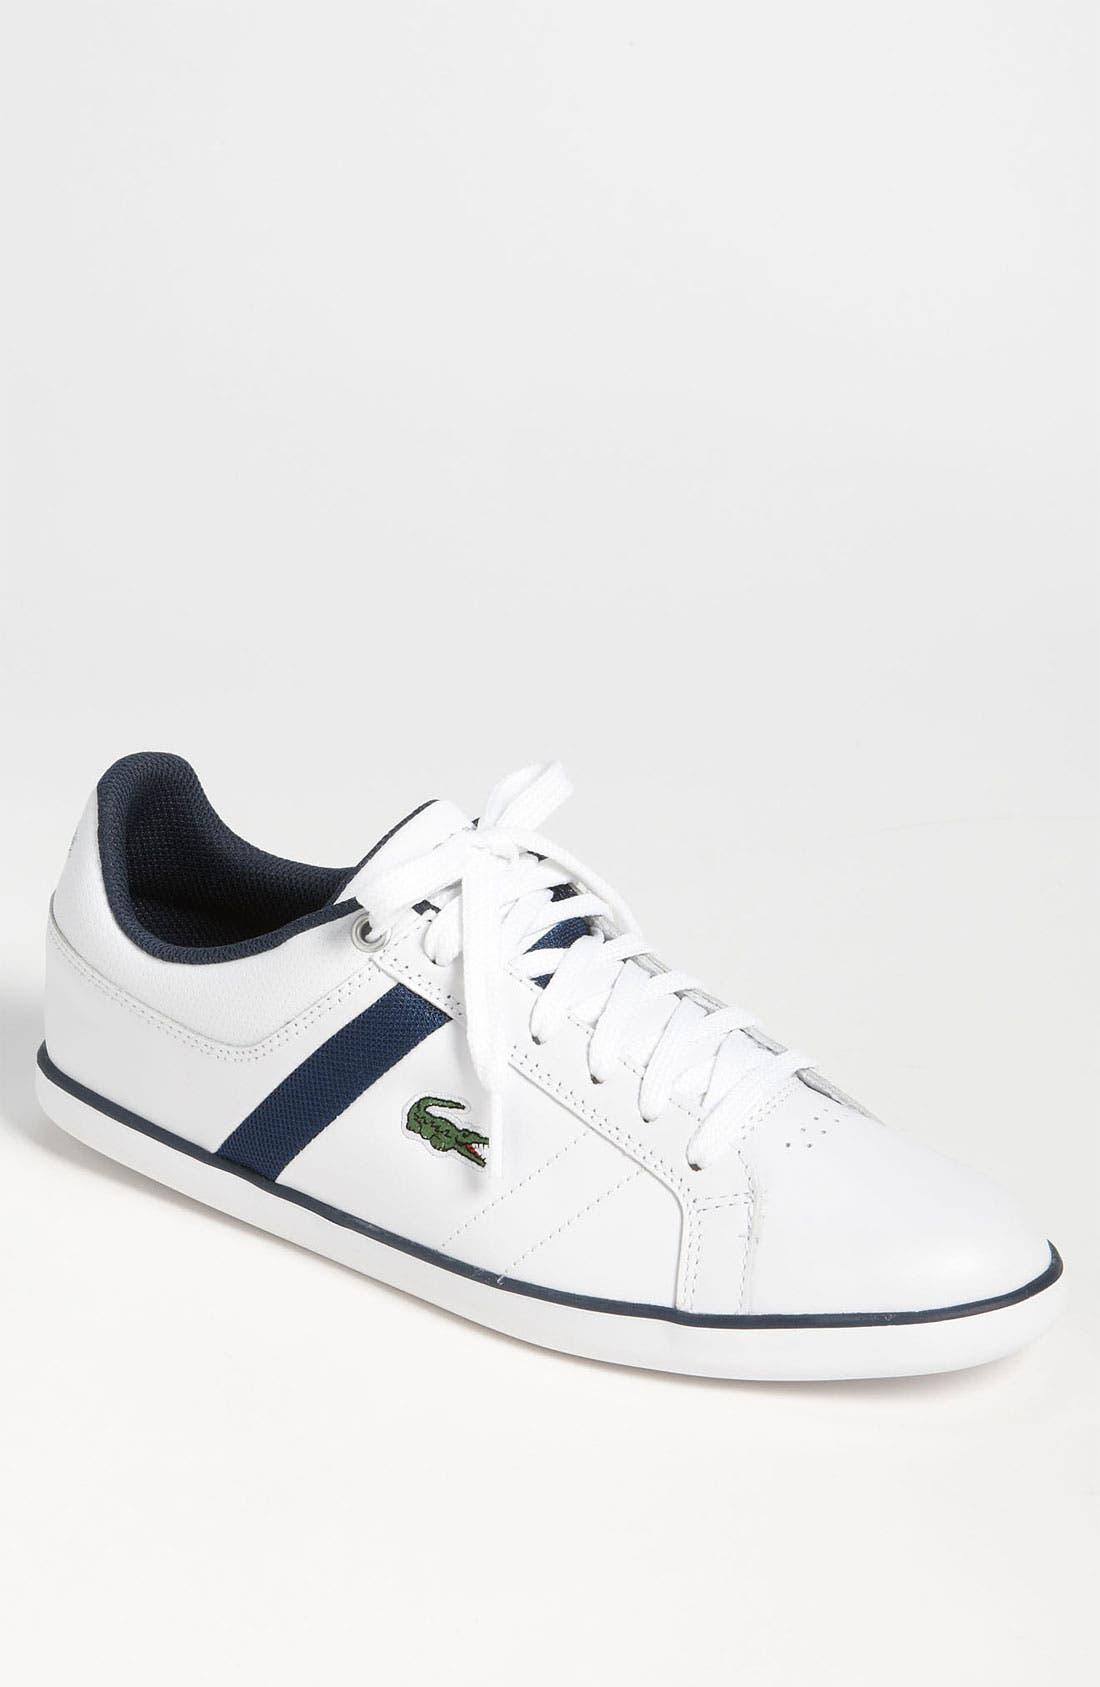 Main Image - Lacoste 'Evershot CR' Sneaker